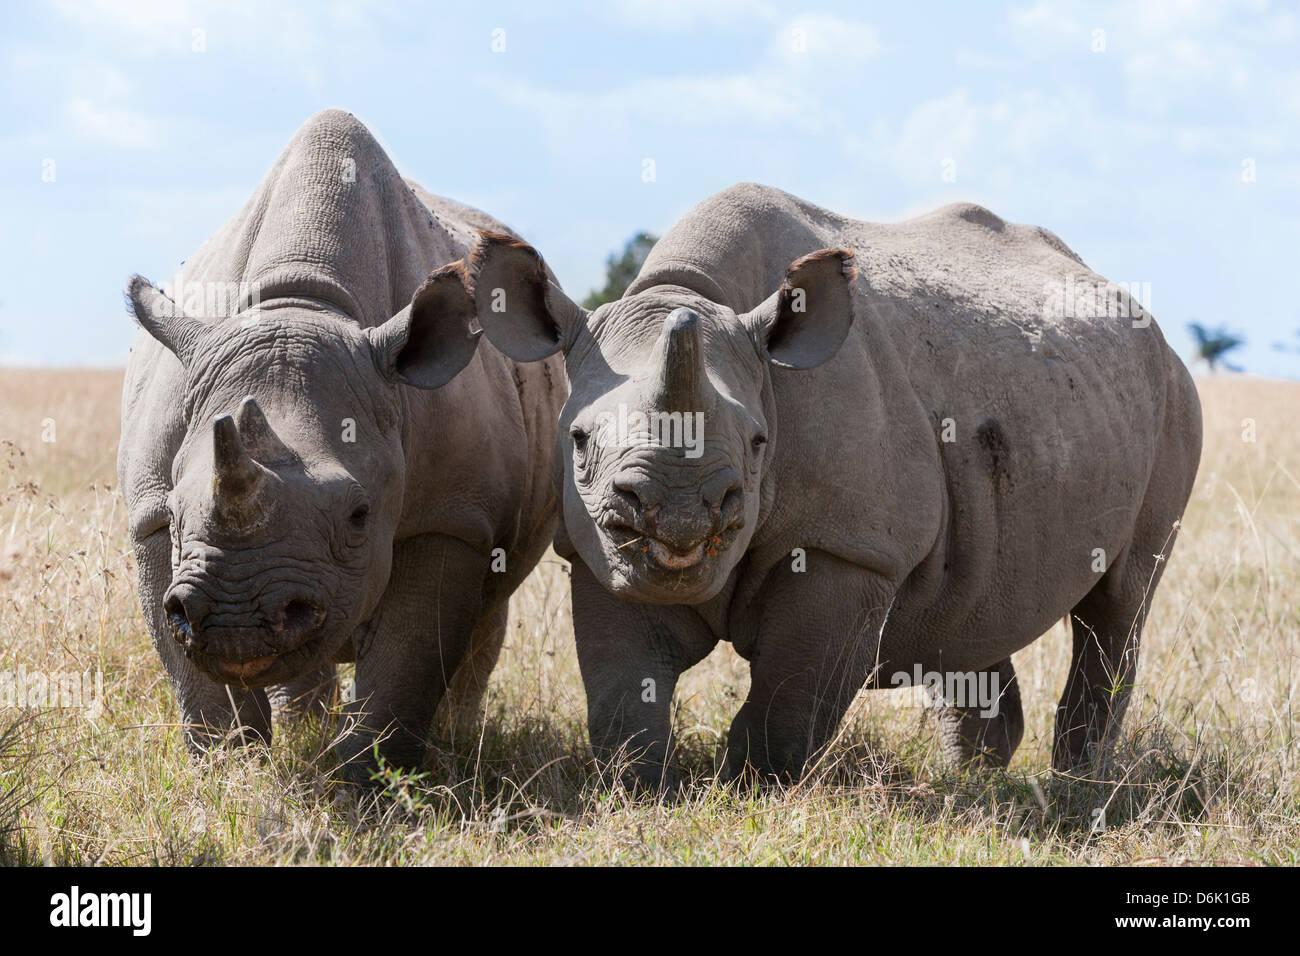 Two rhinoceros, Ol Pejeta Conservancy, Laikipia, Kenya, East Africa, Africa - Stock Image